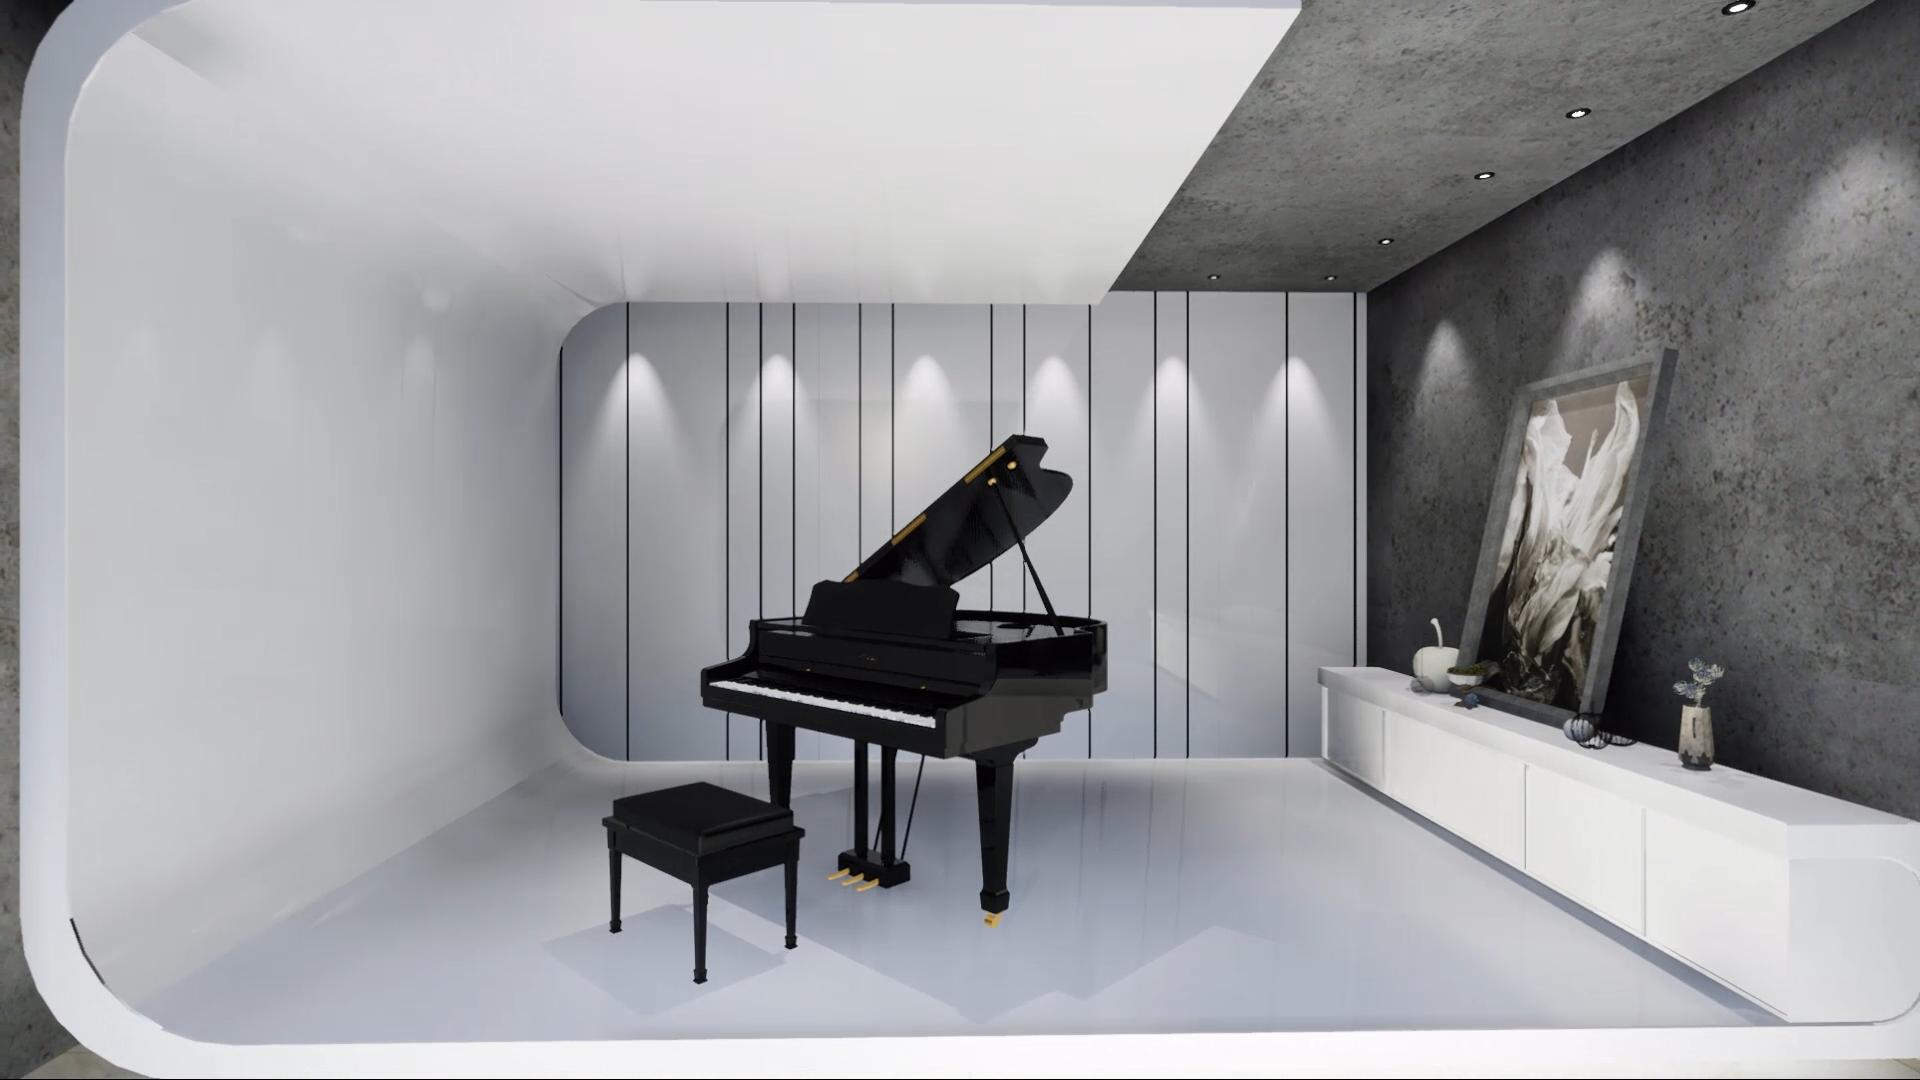 ue4_室内漫游动画,钢琴室|空间|室内设计|jinxin6图片